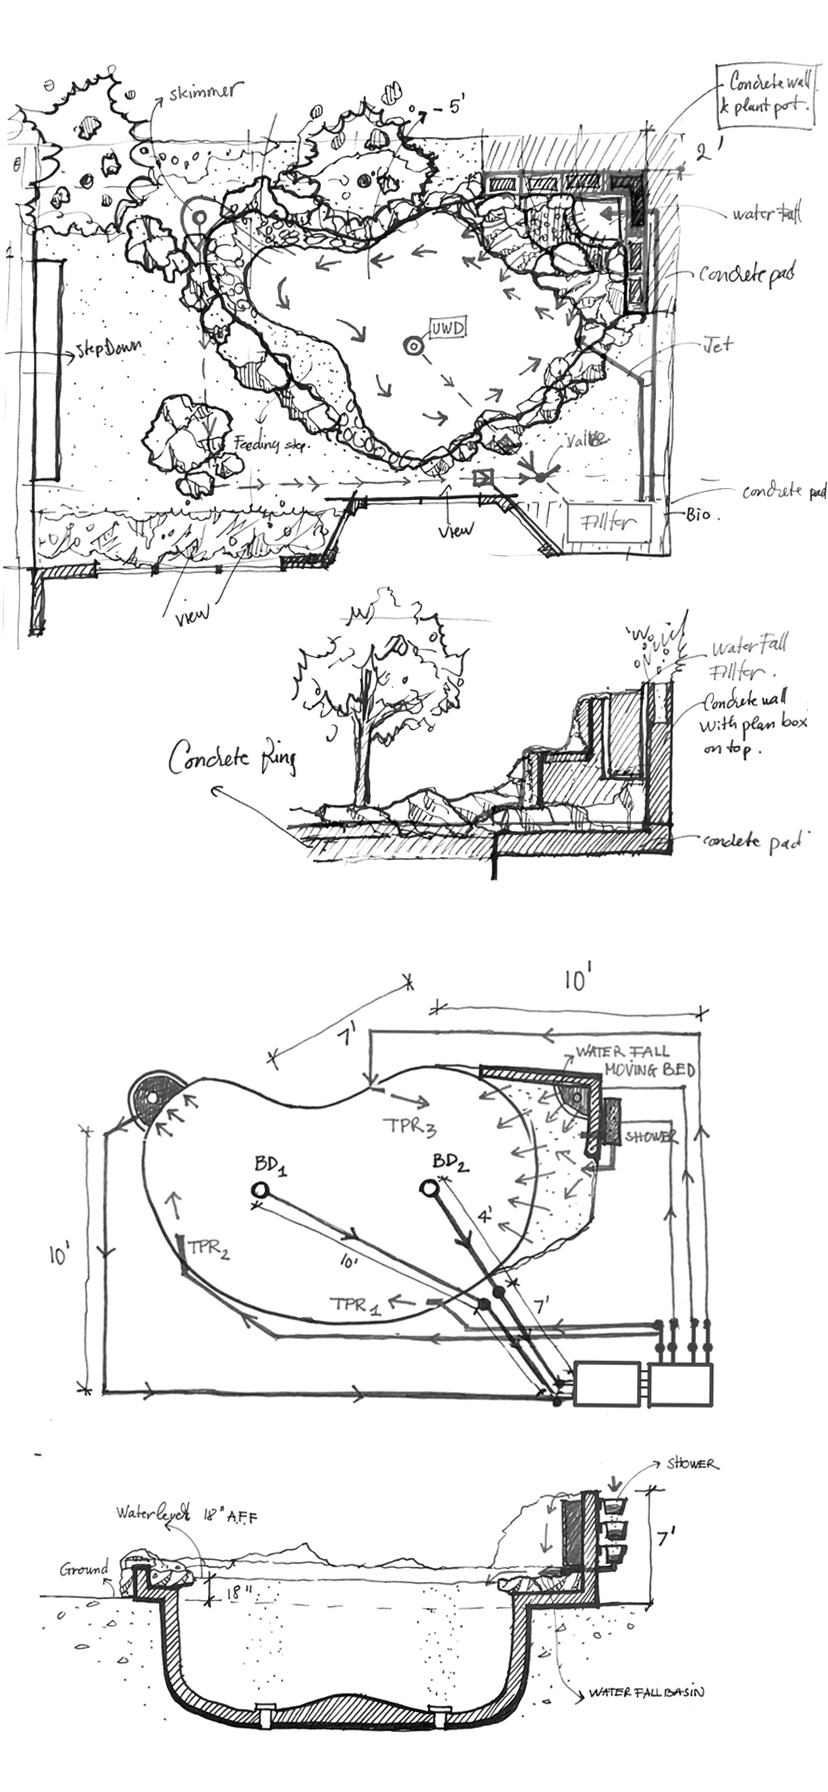 https://aqua.studio/wp-content/uploads/2020/10/Pond-Design-BW.jpg